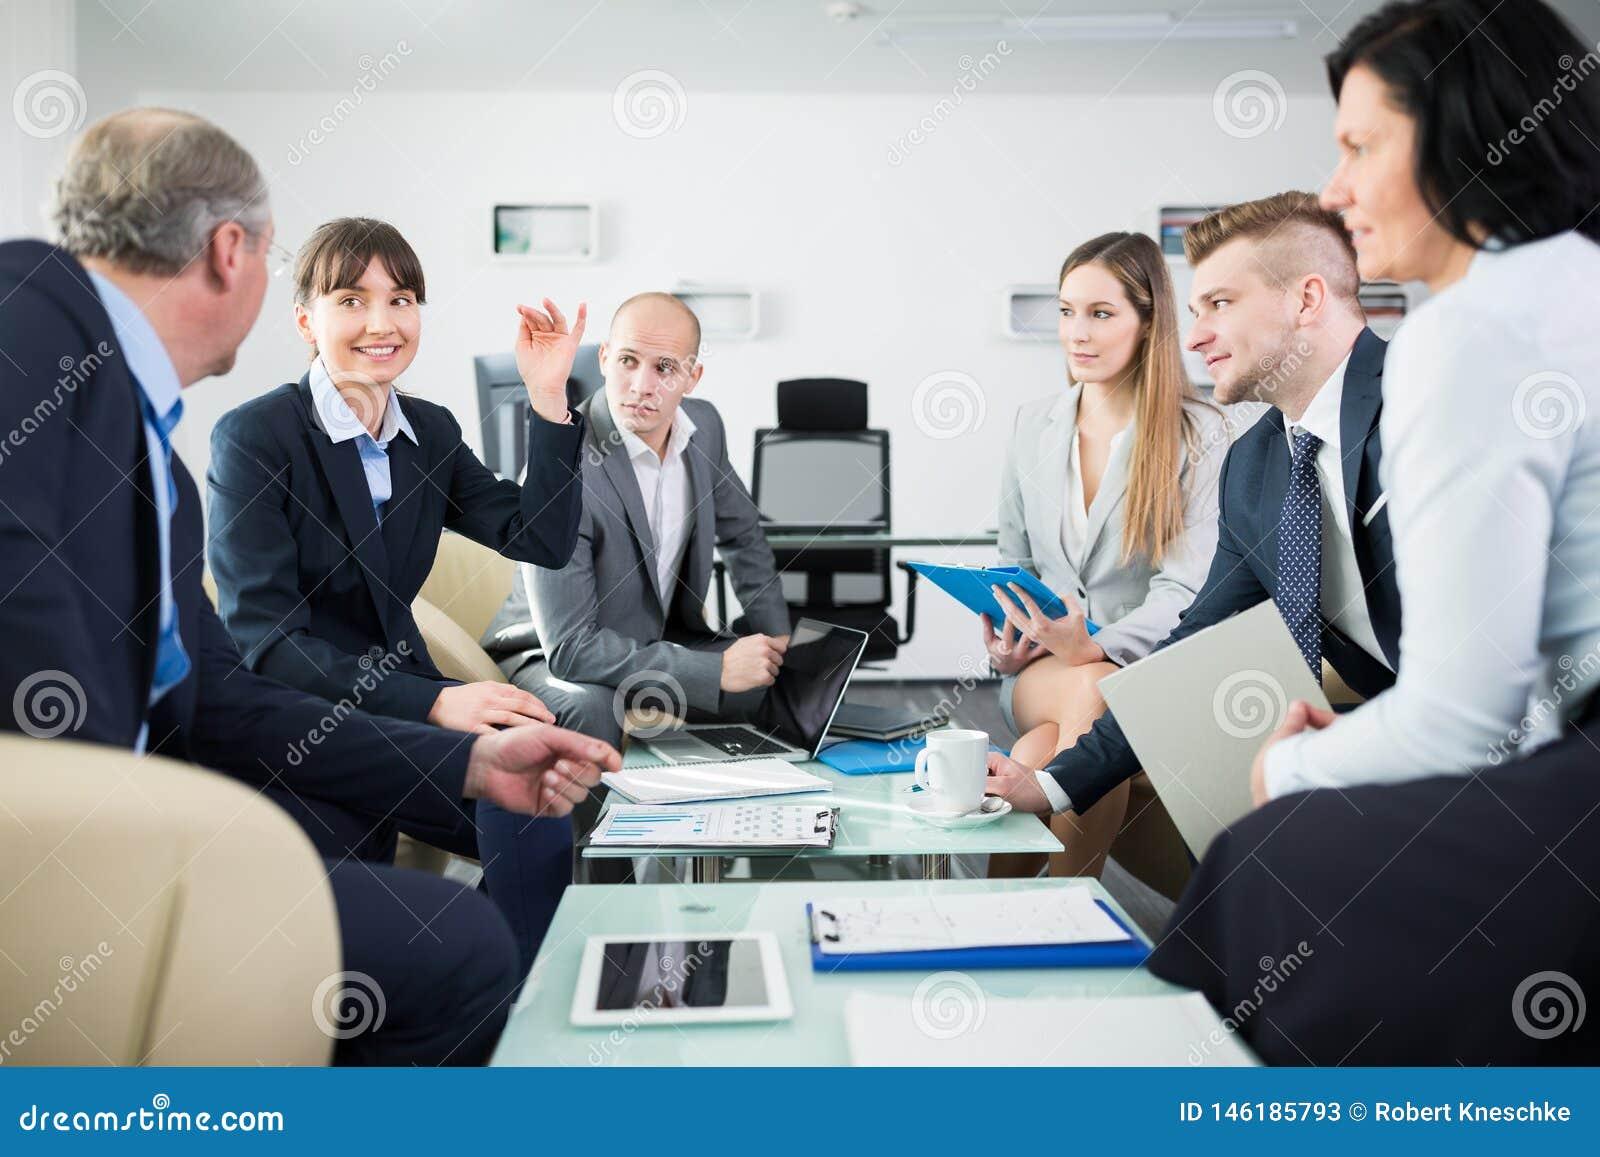 Empresaria sonriente Discussing With Colleagues en oficina